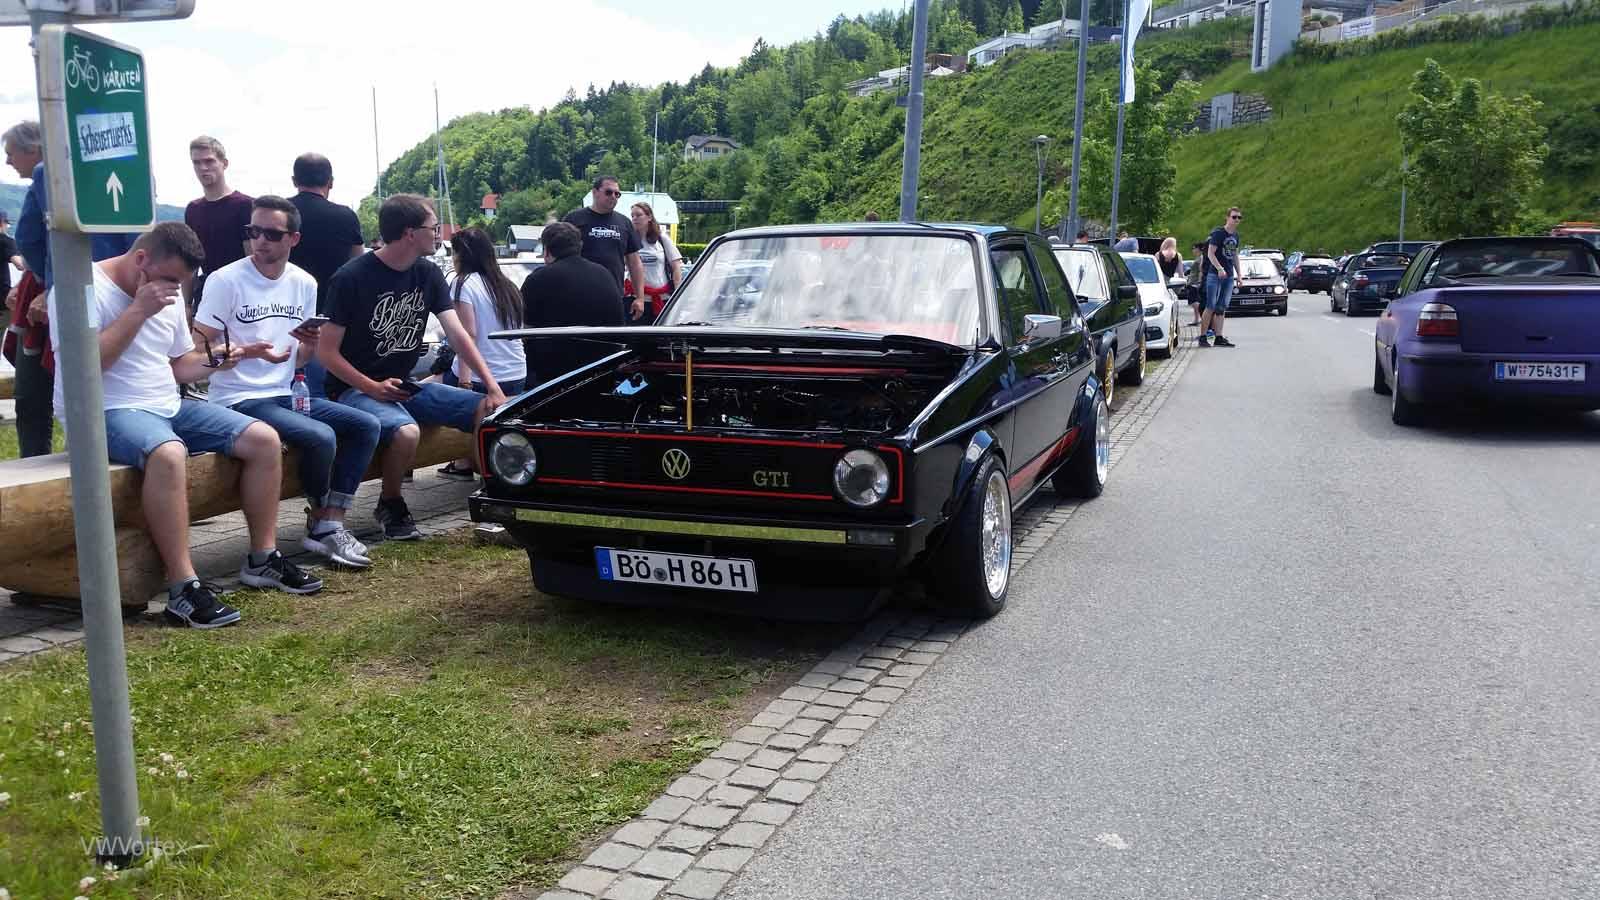 giorgetto giugiaro italdesign AT120397 medium41 110x60 photo